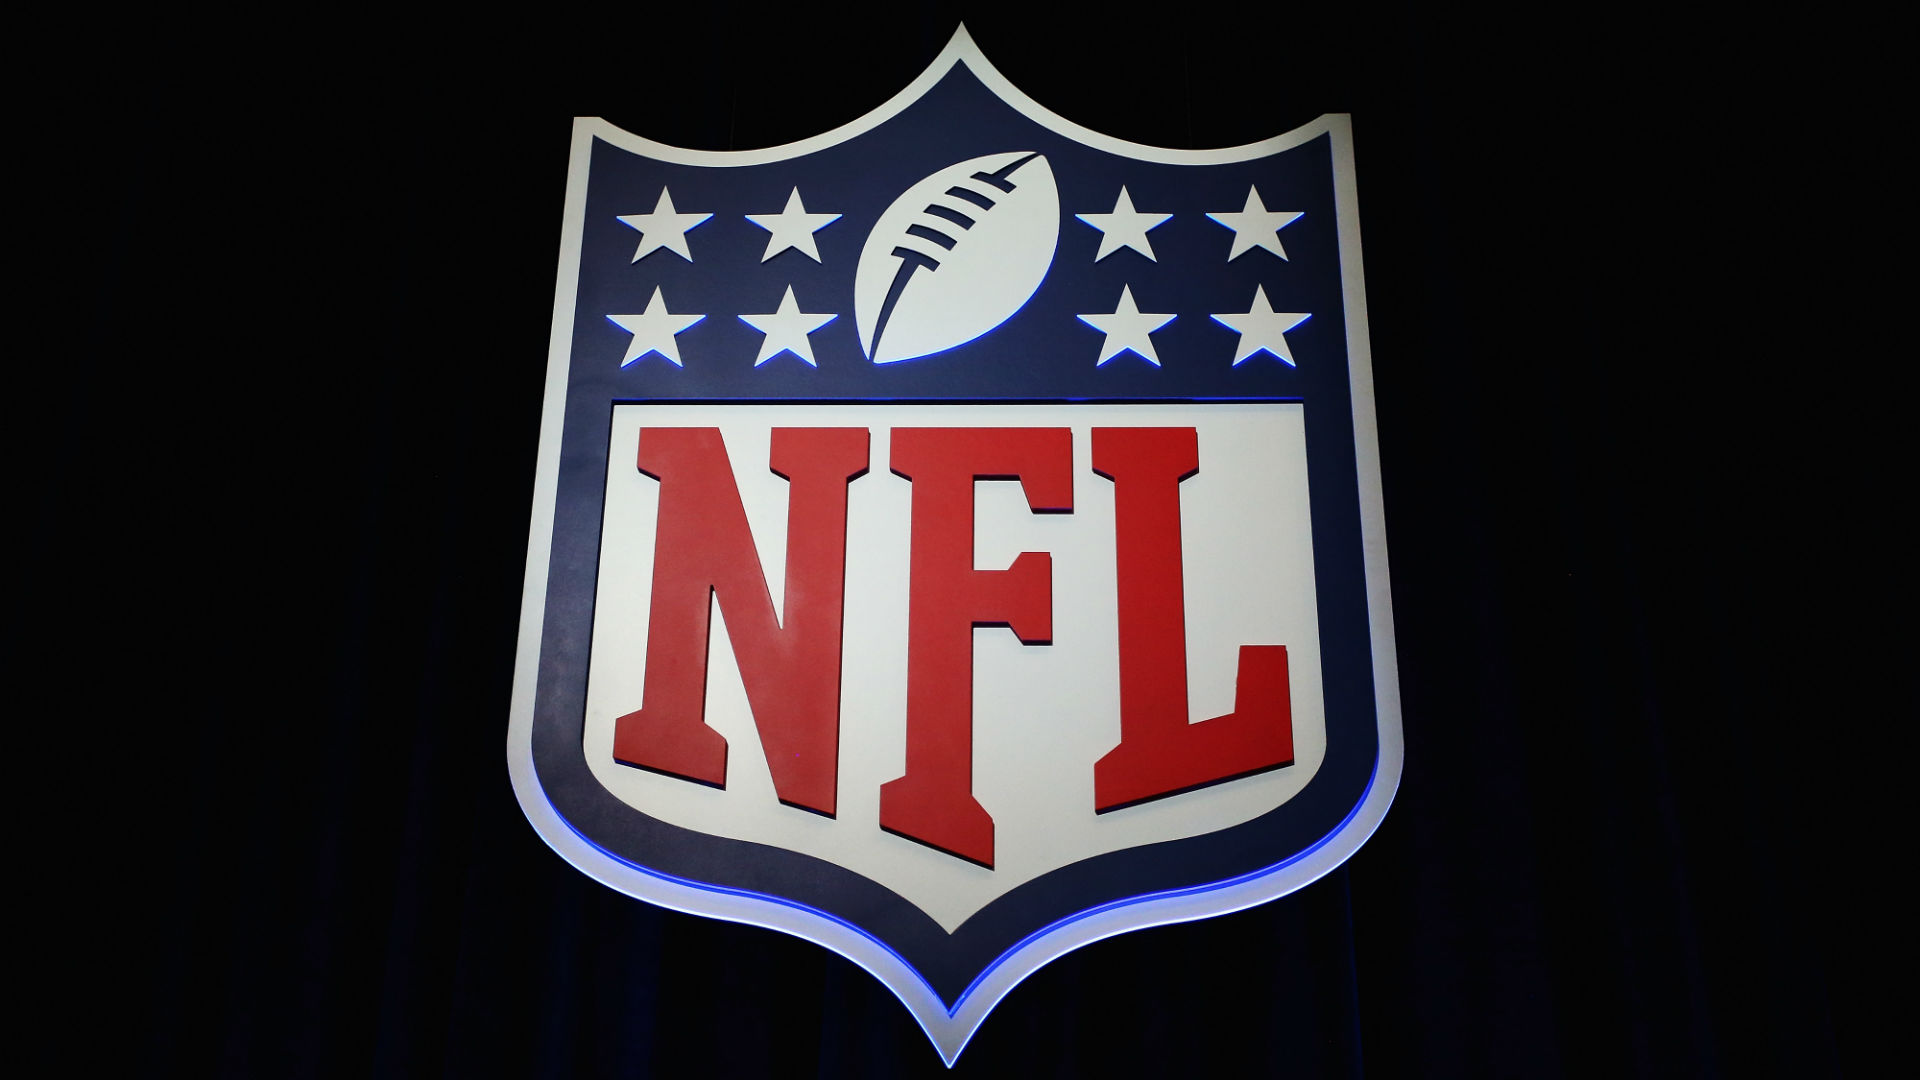 NFL-shield-083018-Getty-FTR.jpg